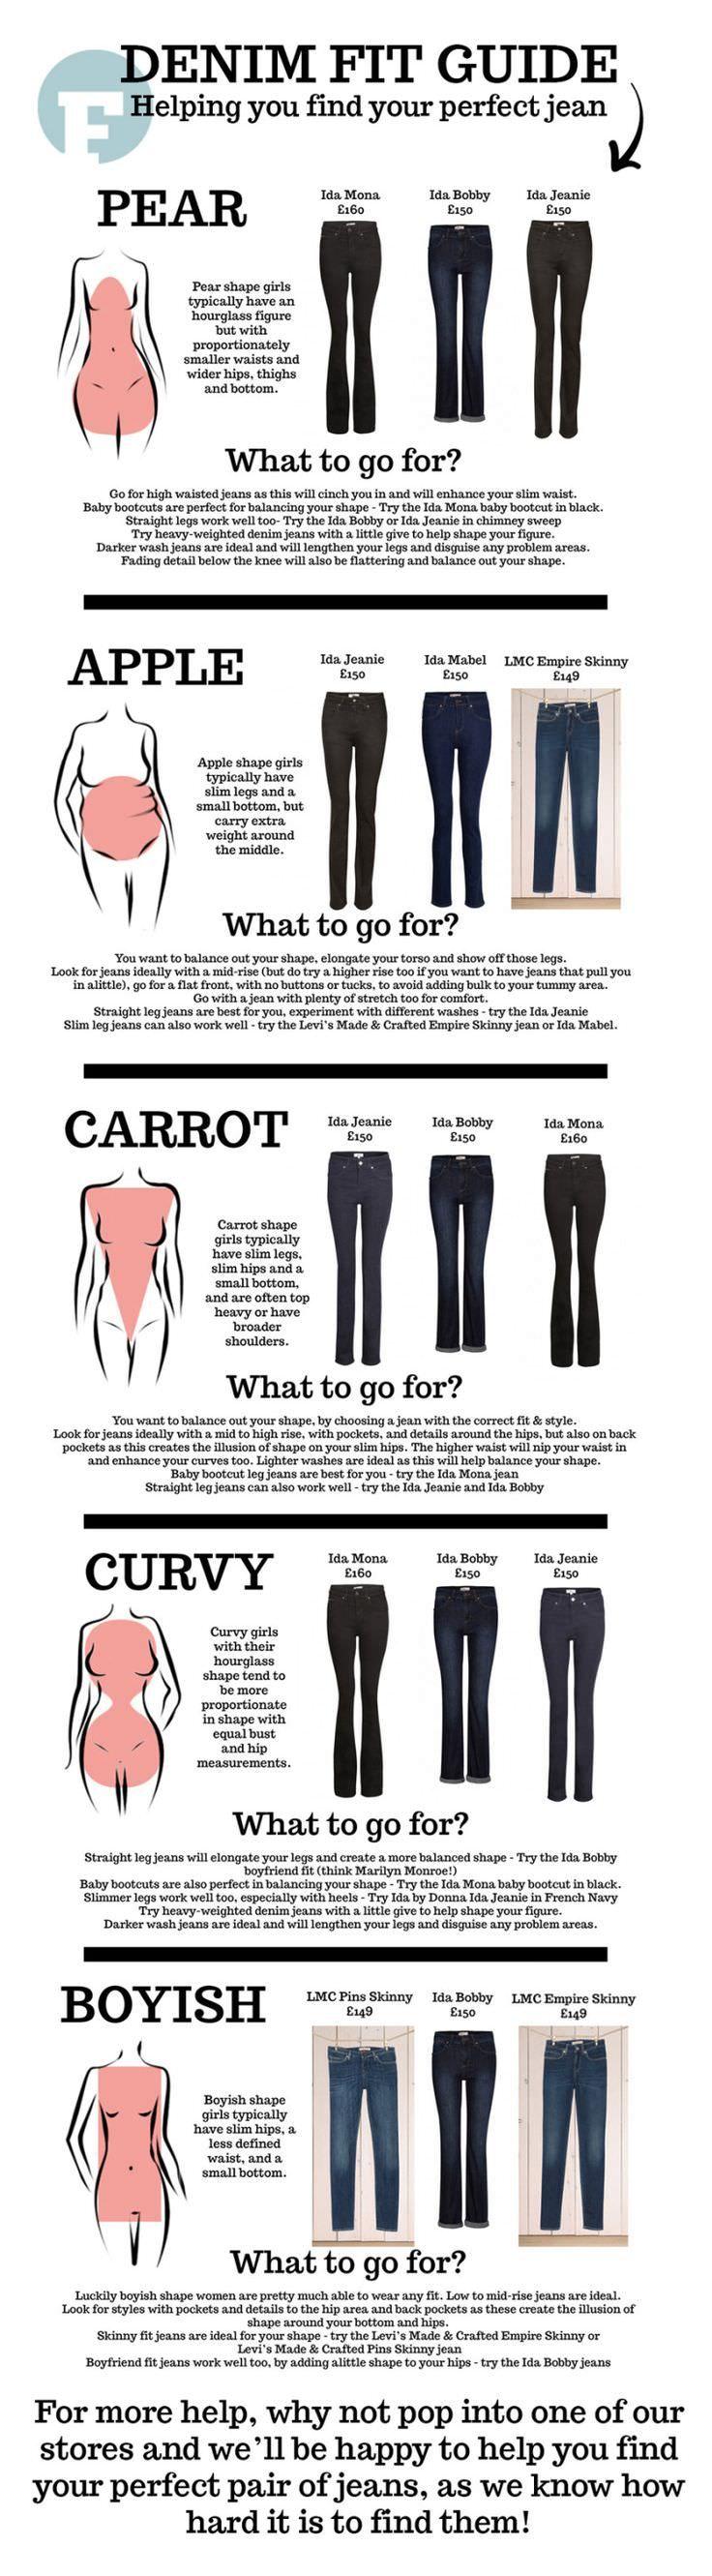 Denim fit by body type